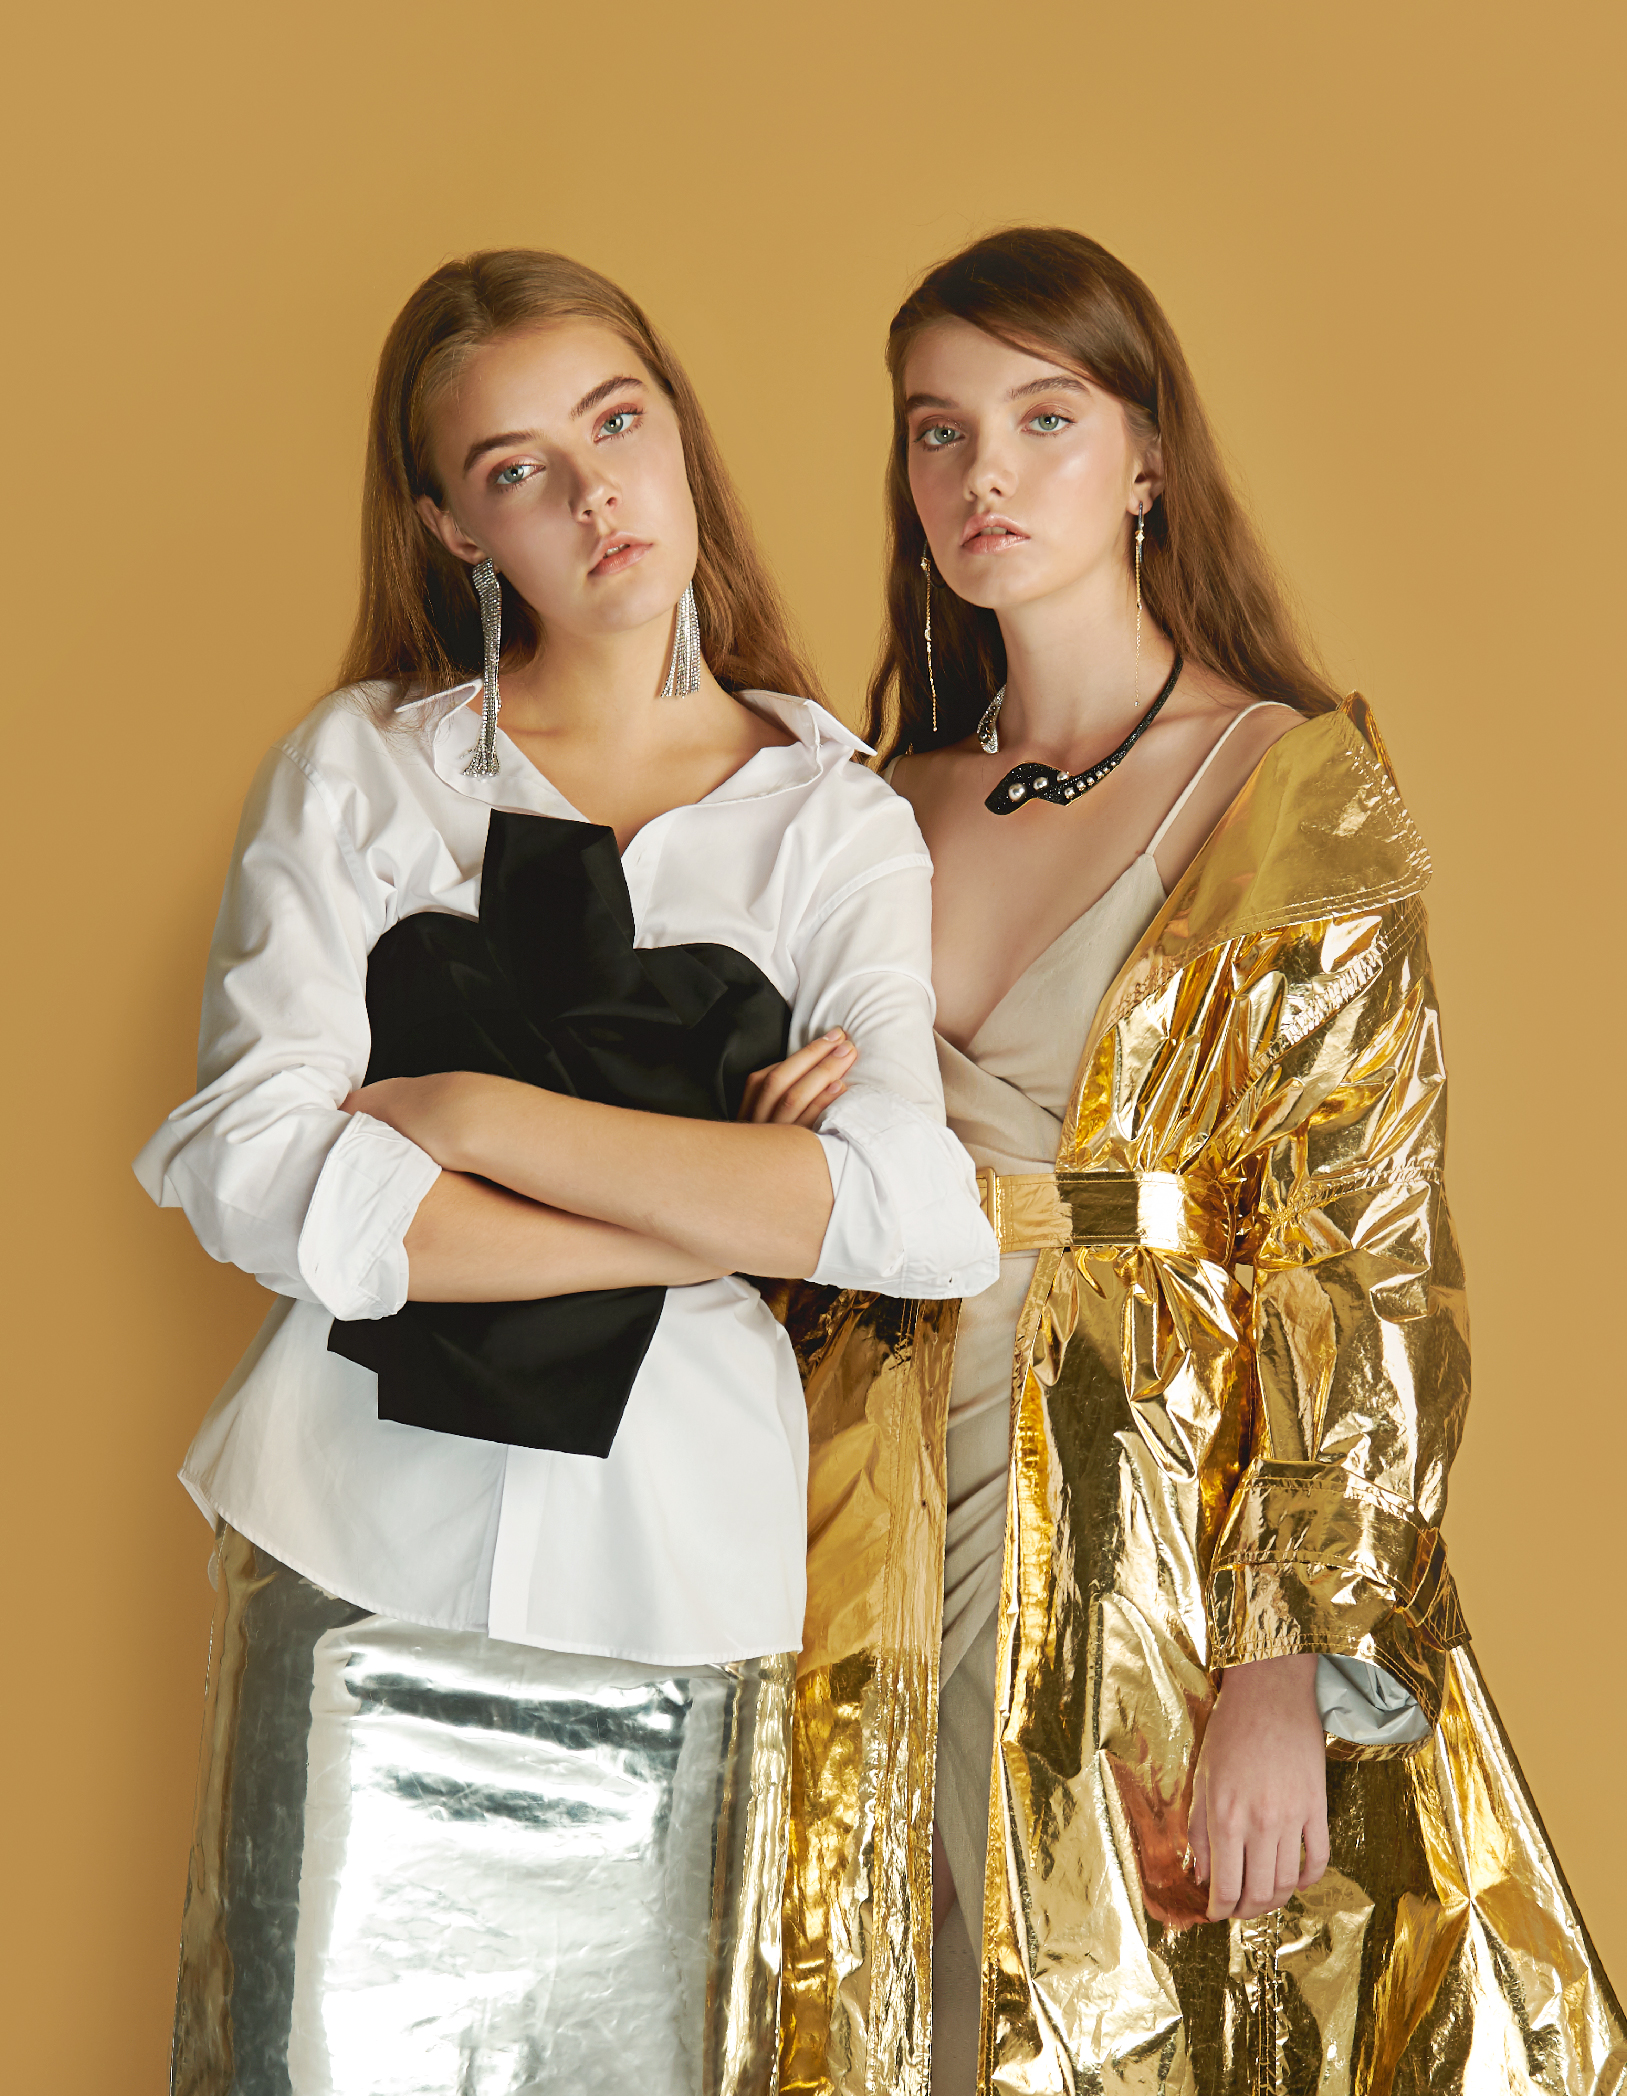 https://s3-ap-southeast-1.amazonaws.com/bchurunway/lookbook/fashion-bold/lookbook_fashion+Bold_edit+photo-07.jpg